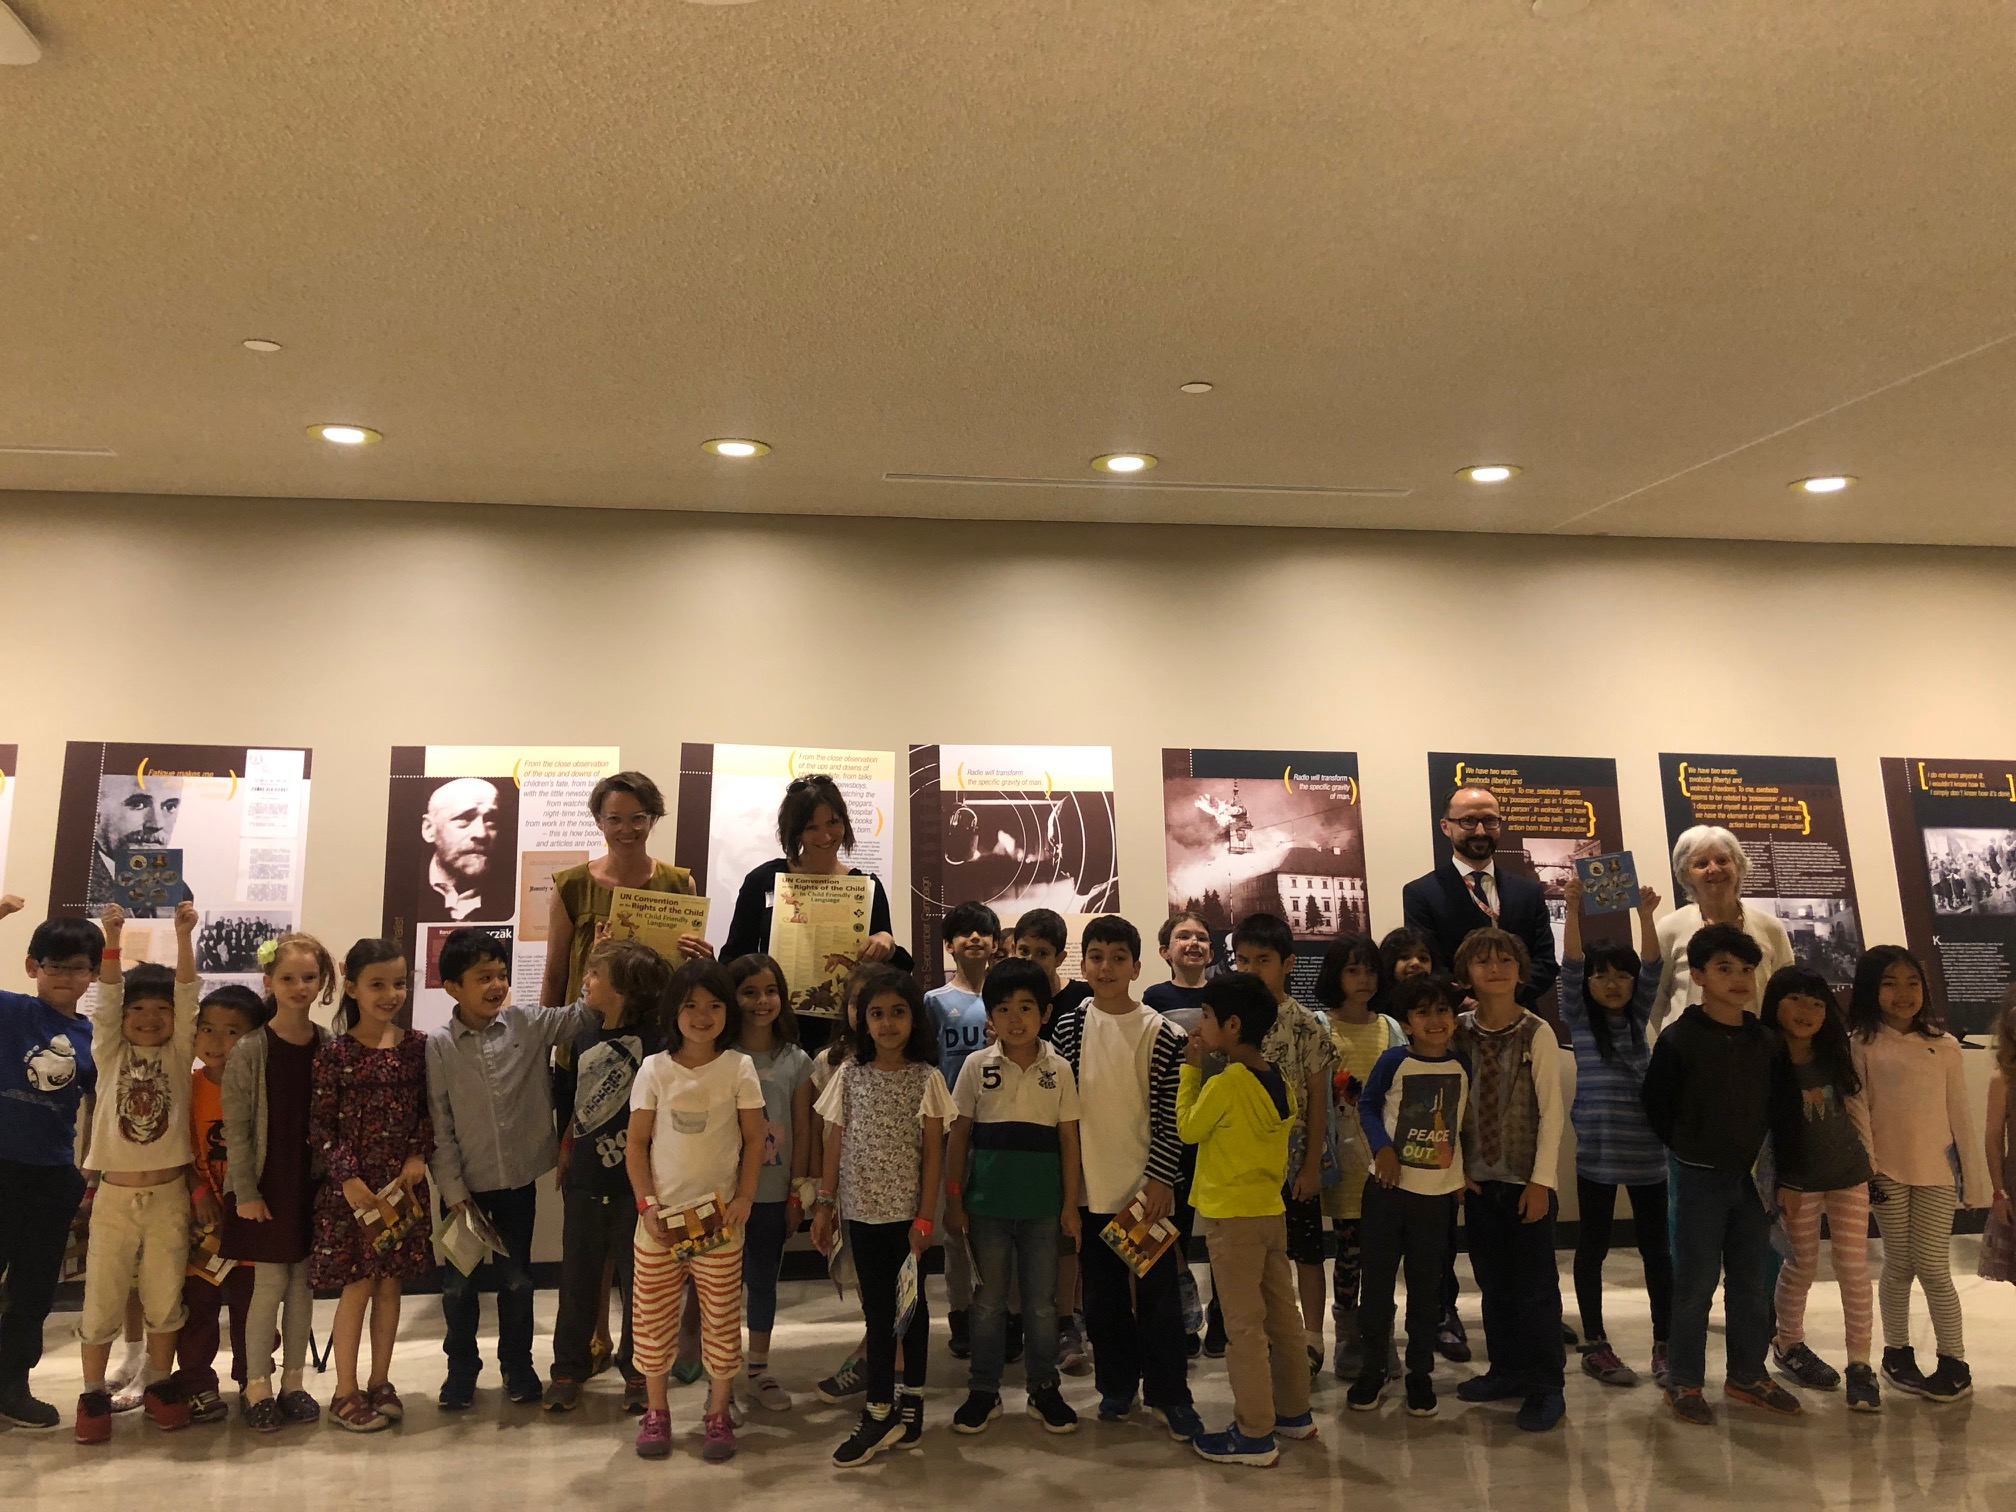 "NYC: Exhibition ""Janusz Korczak: Champion of the Children"" at the United Nations"